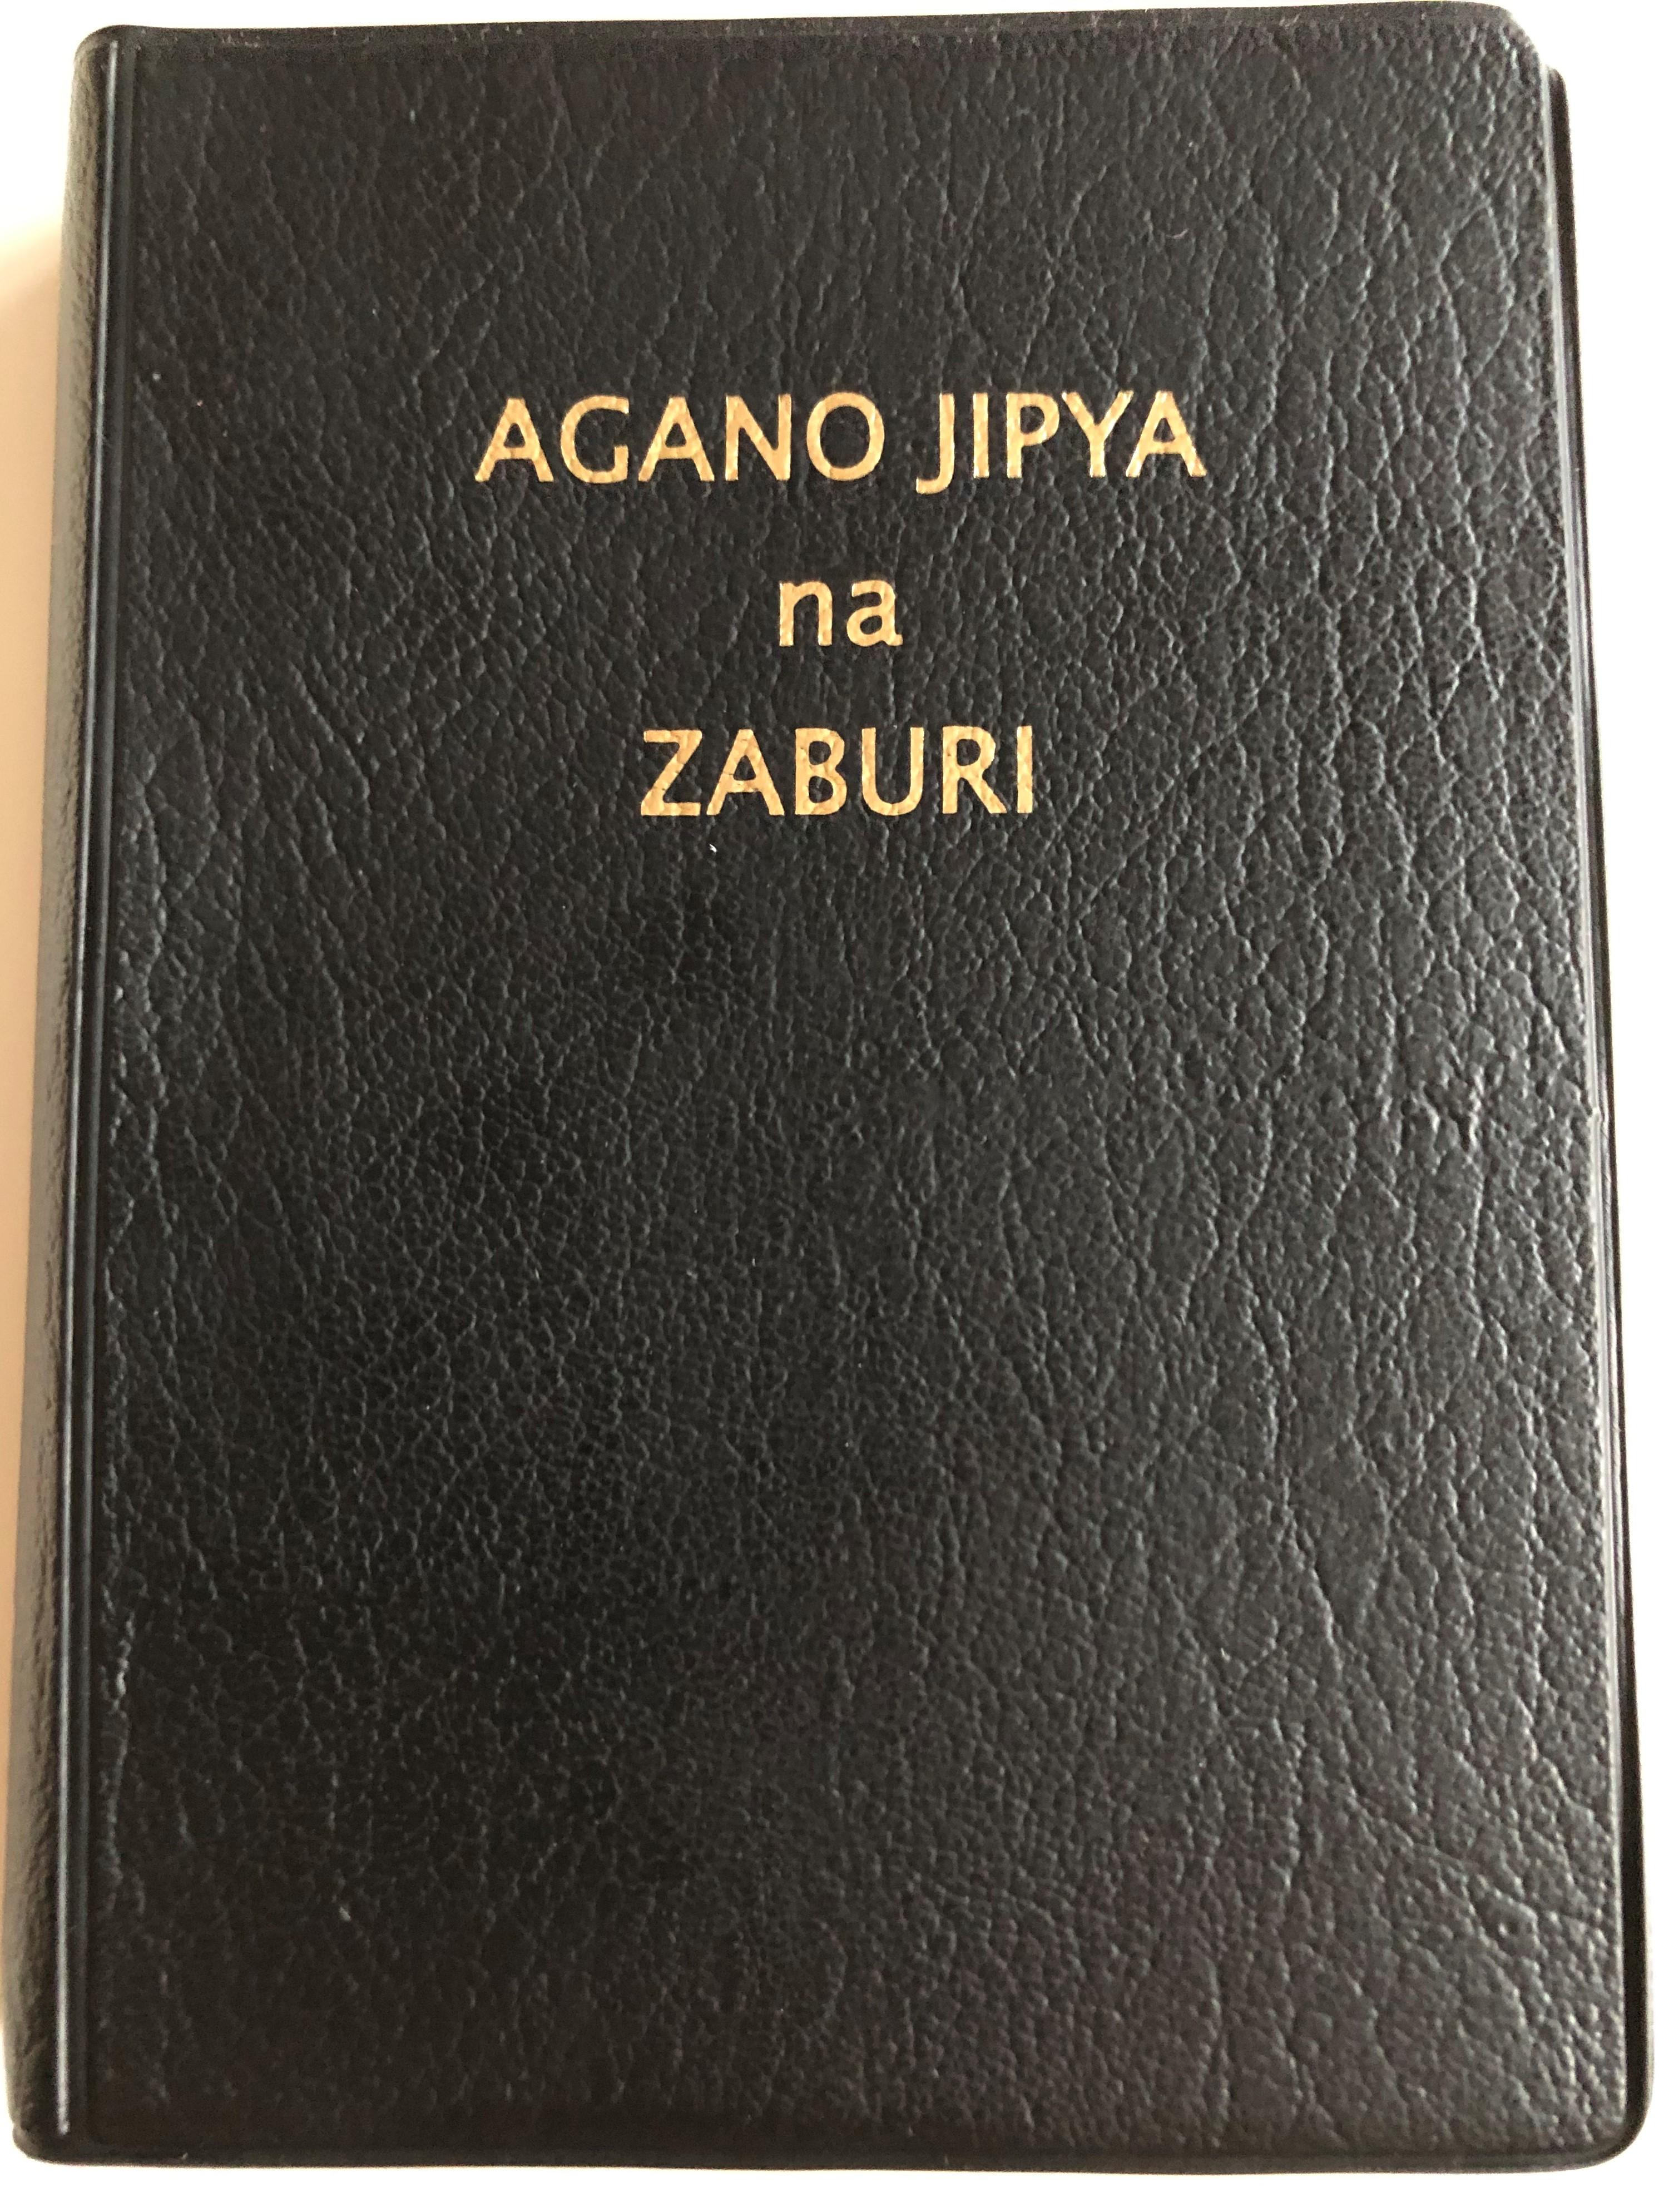 kiswahili-new-testament-psalms-agano-jipya-na-zaburi-1.jpg